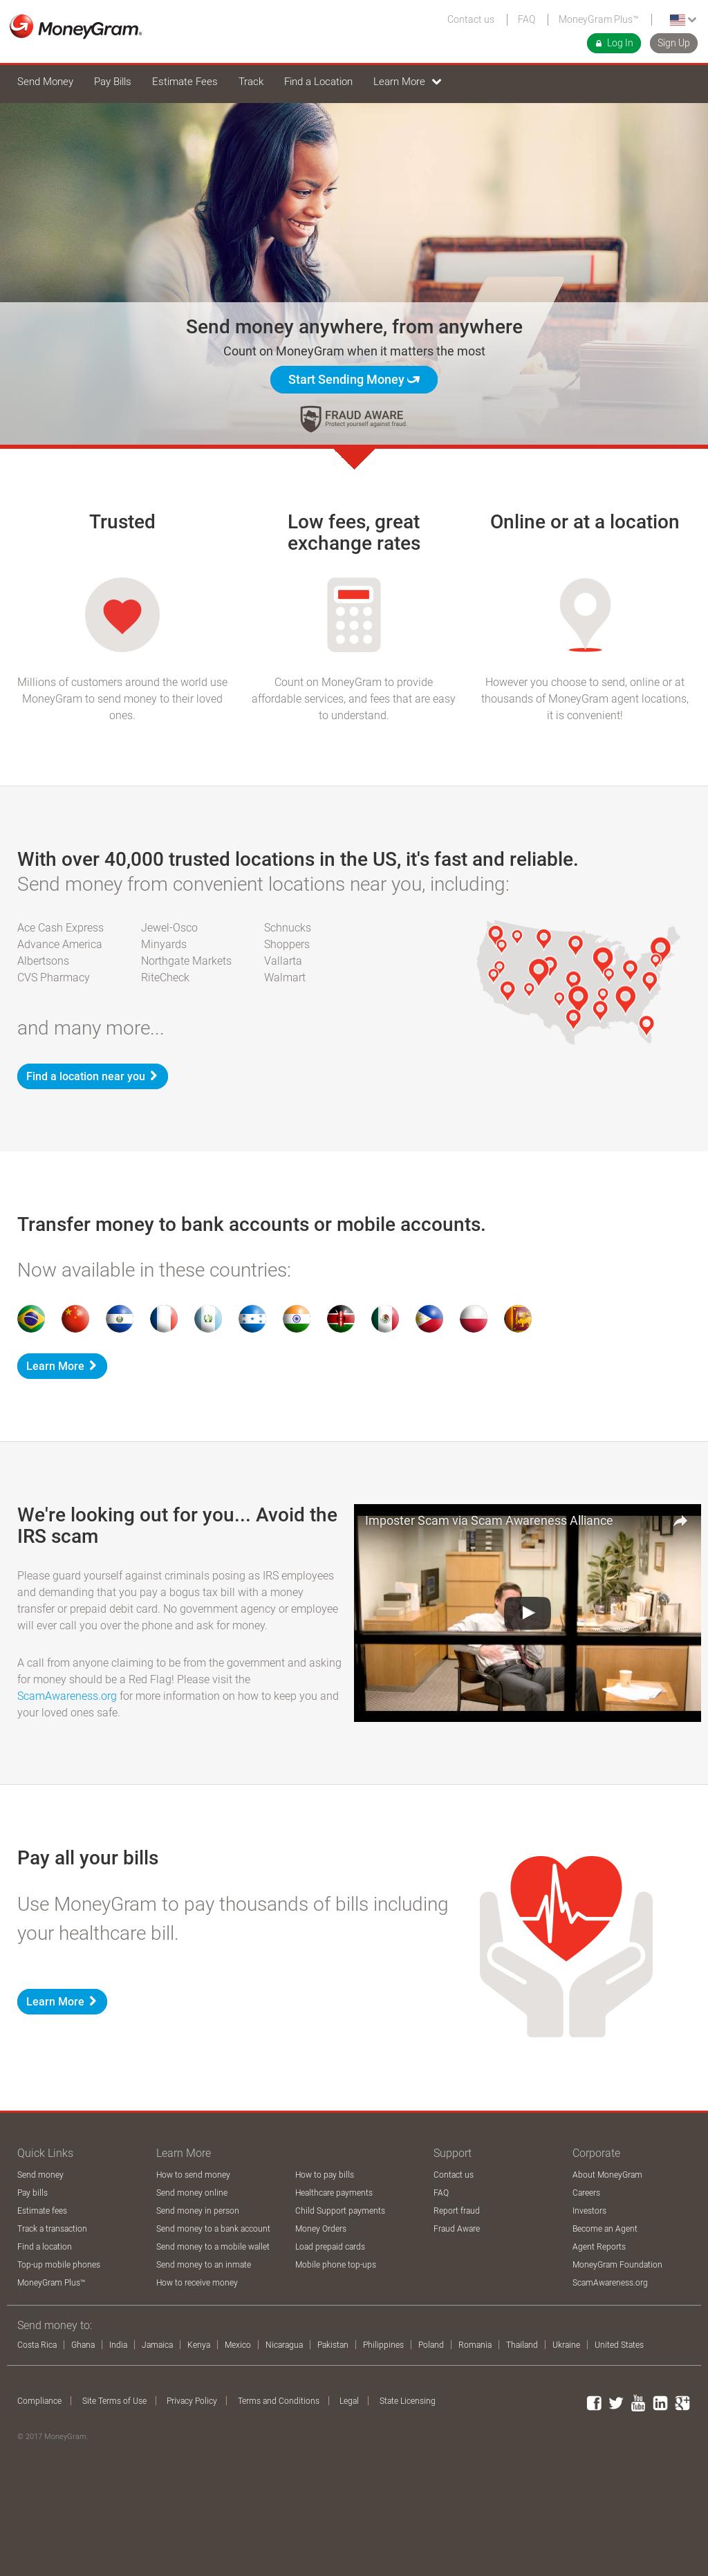 MoneyGram Competitors, Revenue and Employees - Owler Company